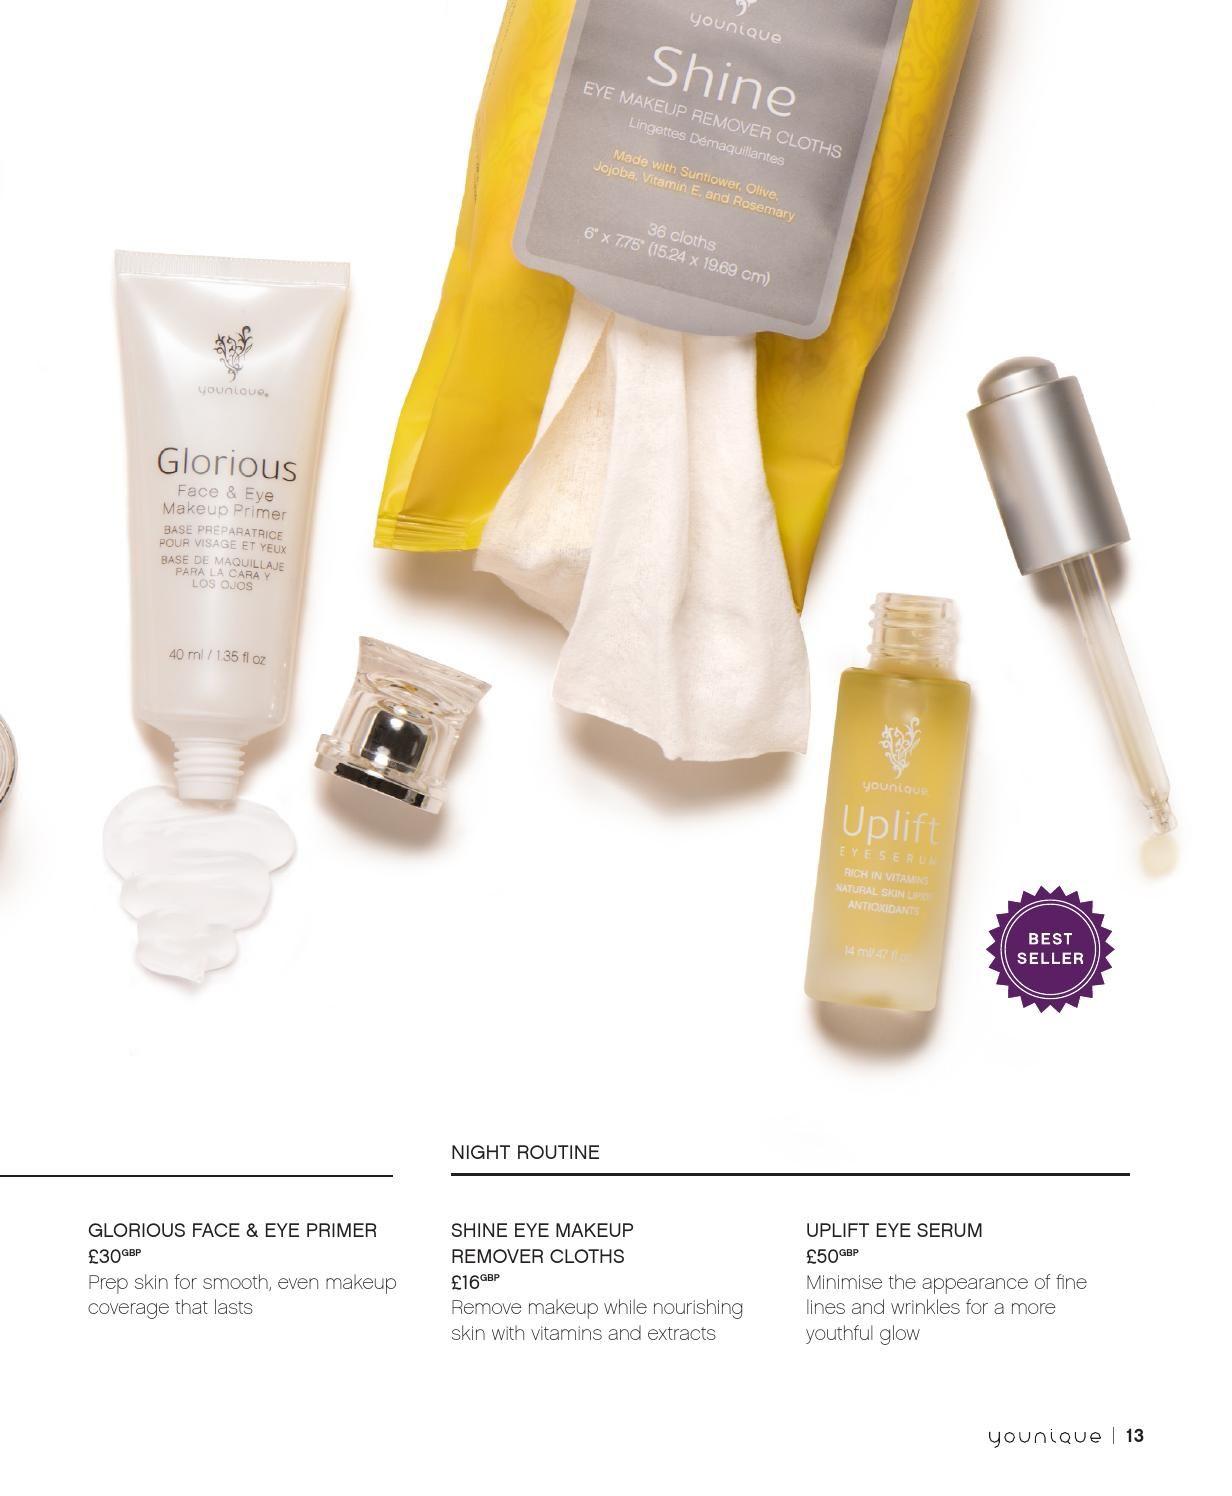 Younique Cosmetics & Skin Care Catalog Younique, Uplift